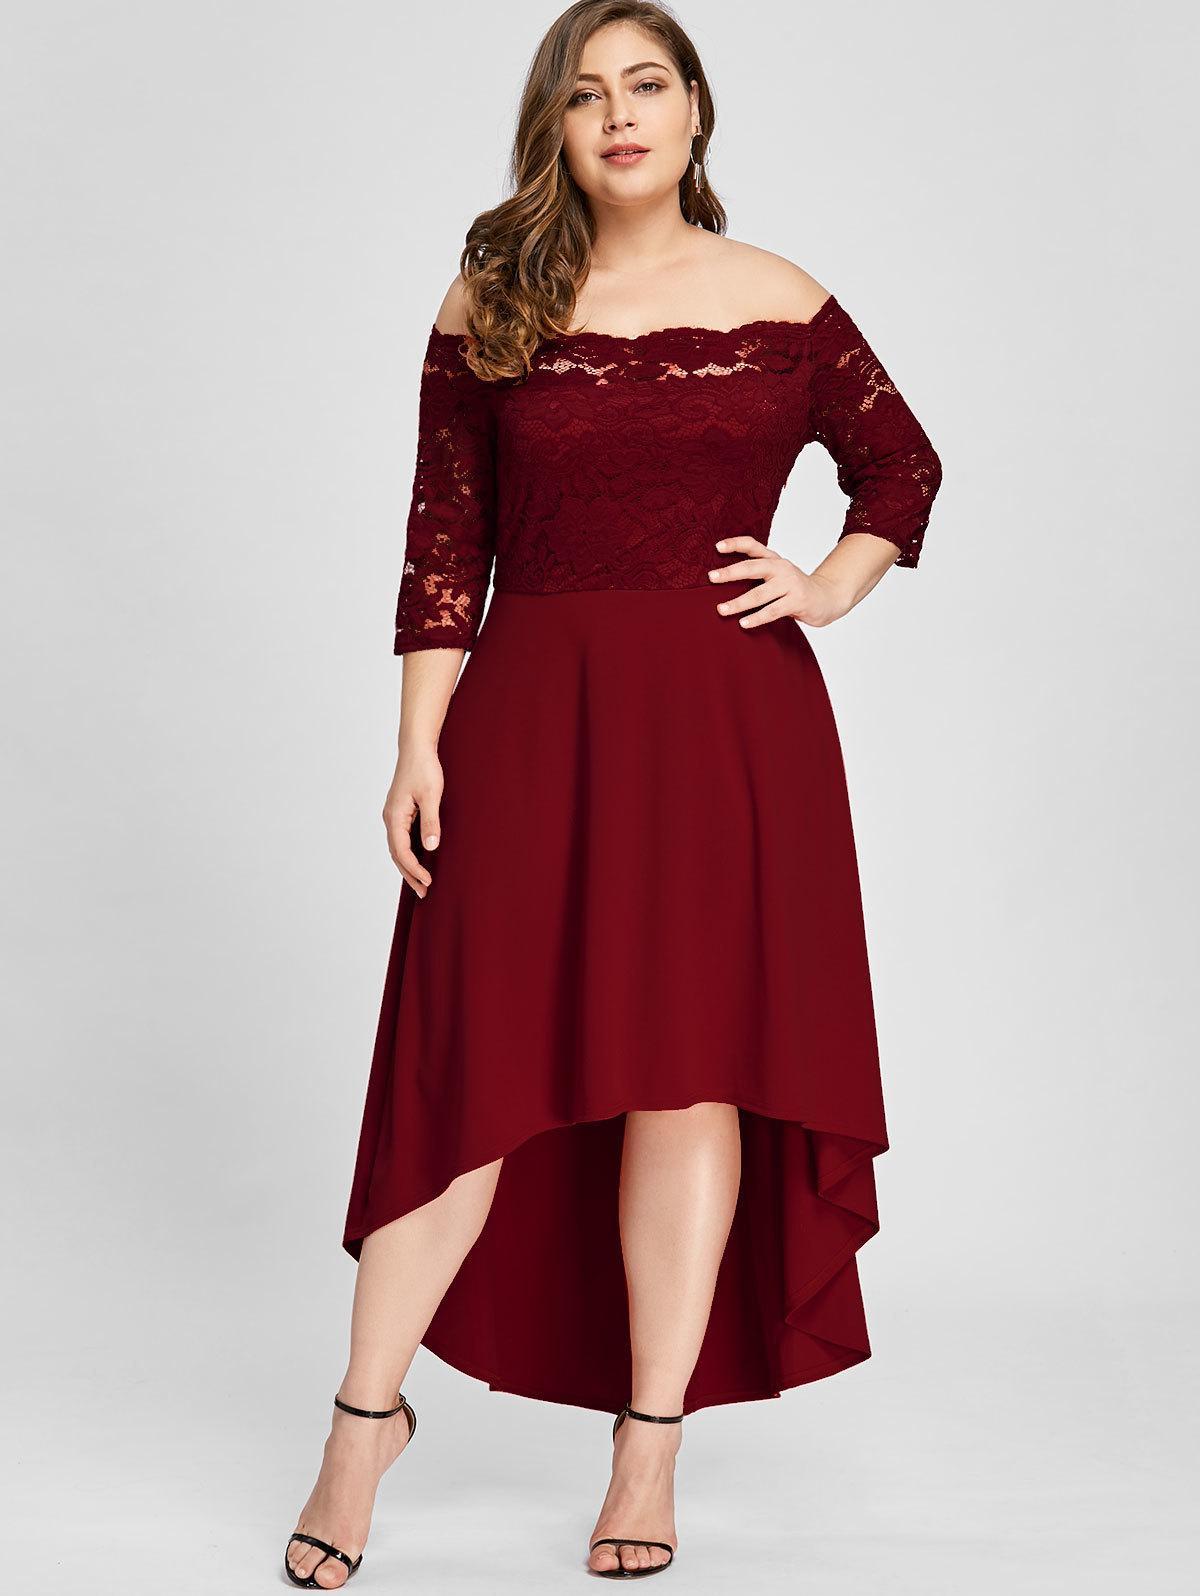 2019 Gamiss Women Party Dress Plus Size Off Shoulder Dip Hem Lace 3 4 Length  Sleeves Dress Asymmetrical Elegant Vestidos Big Size 5XL Y19012102 From ... f3260116e4cb